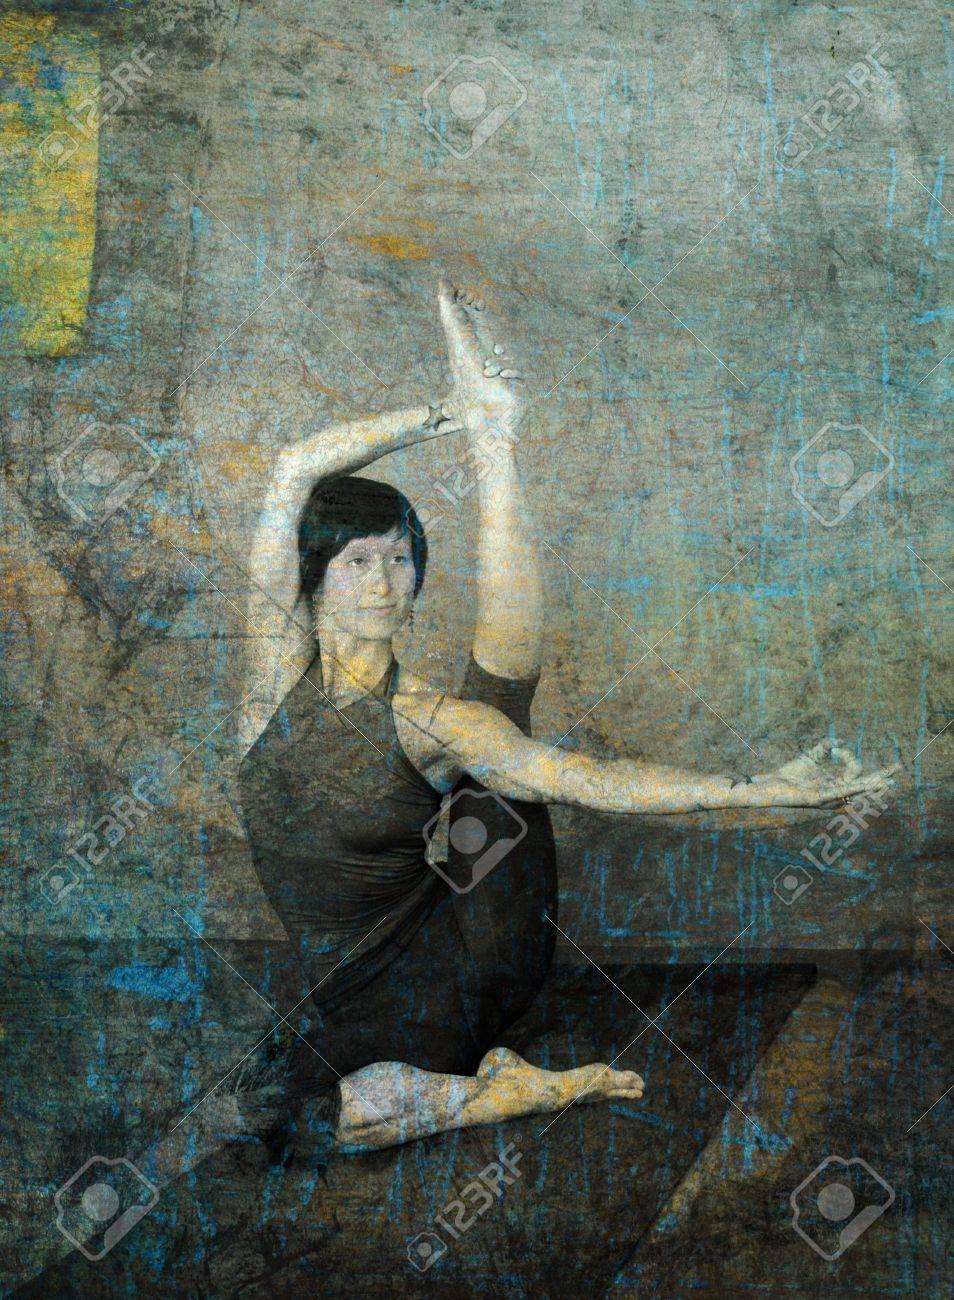 Woman in yoga pose photo based illustration. Stock Photo - 5924842